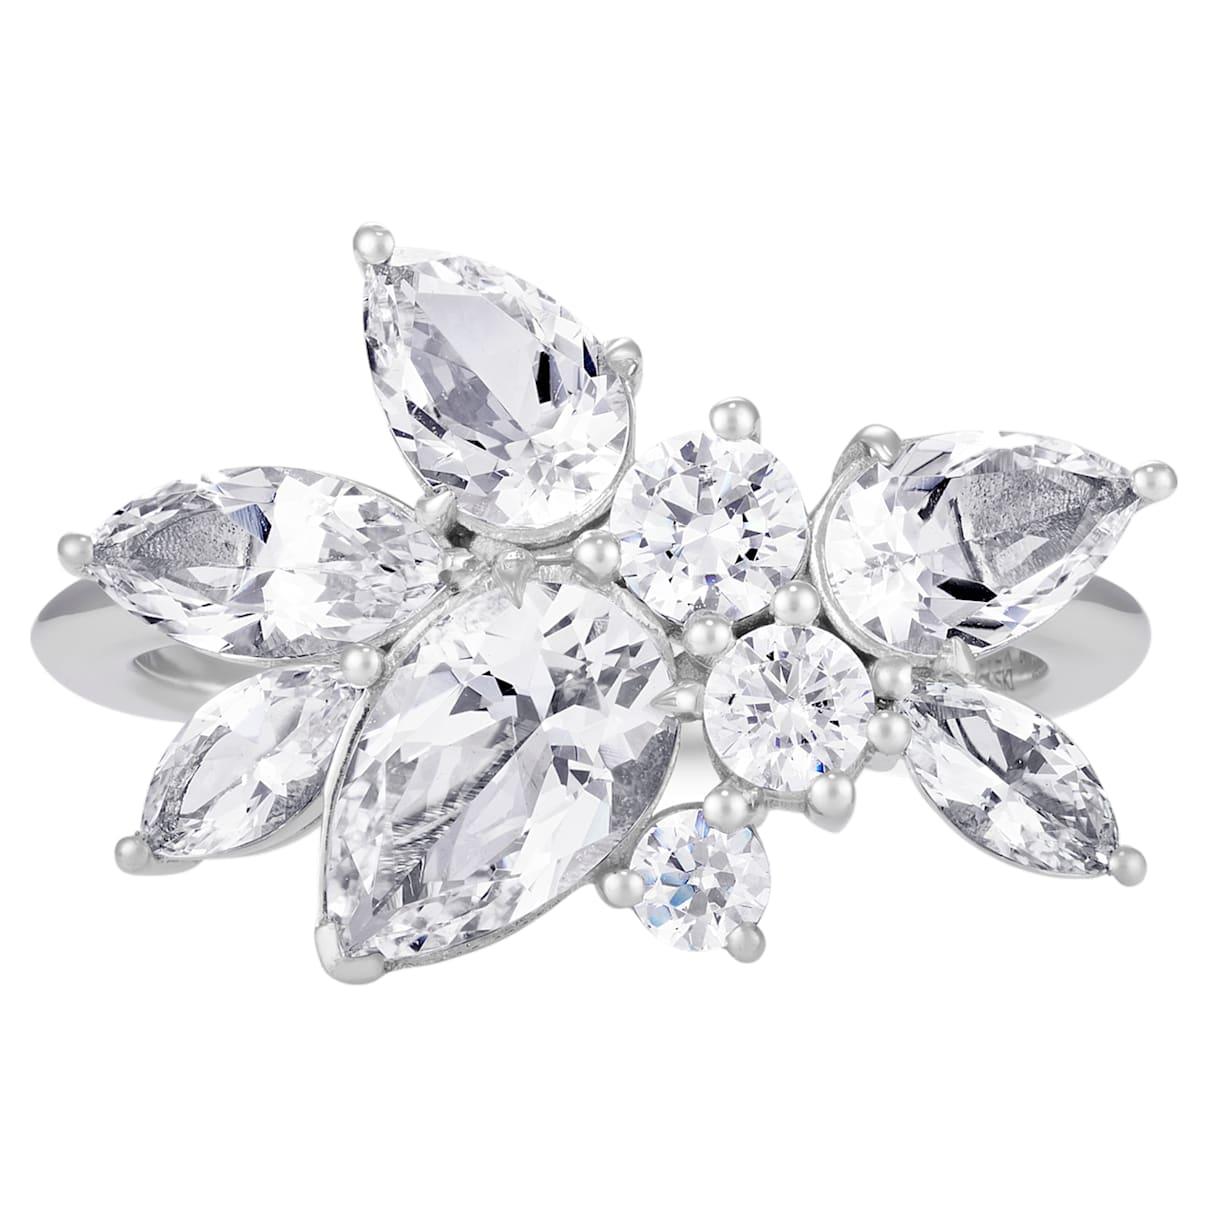 Luna Cluster Ring, Swarovski Created Diamonds, 18K White Gold, Size 52